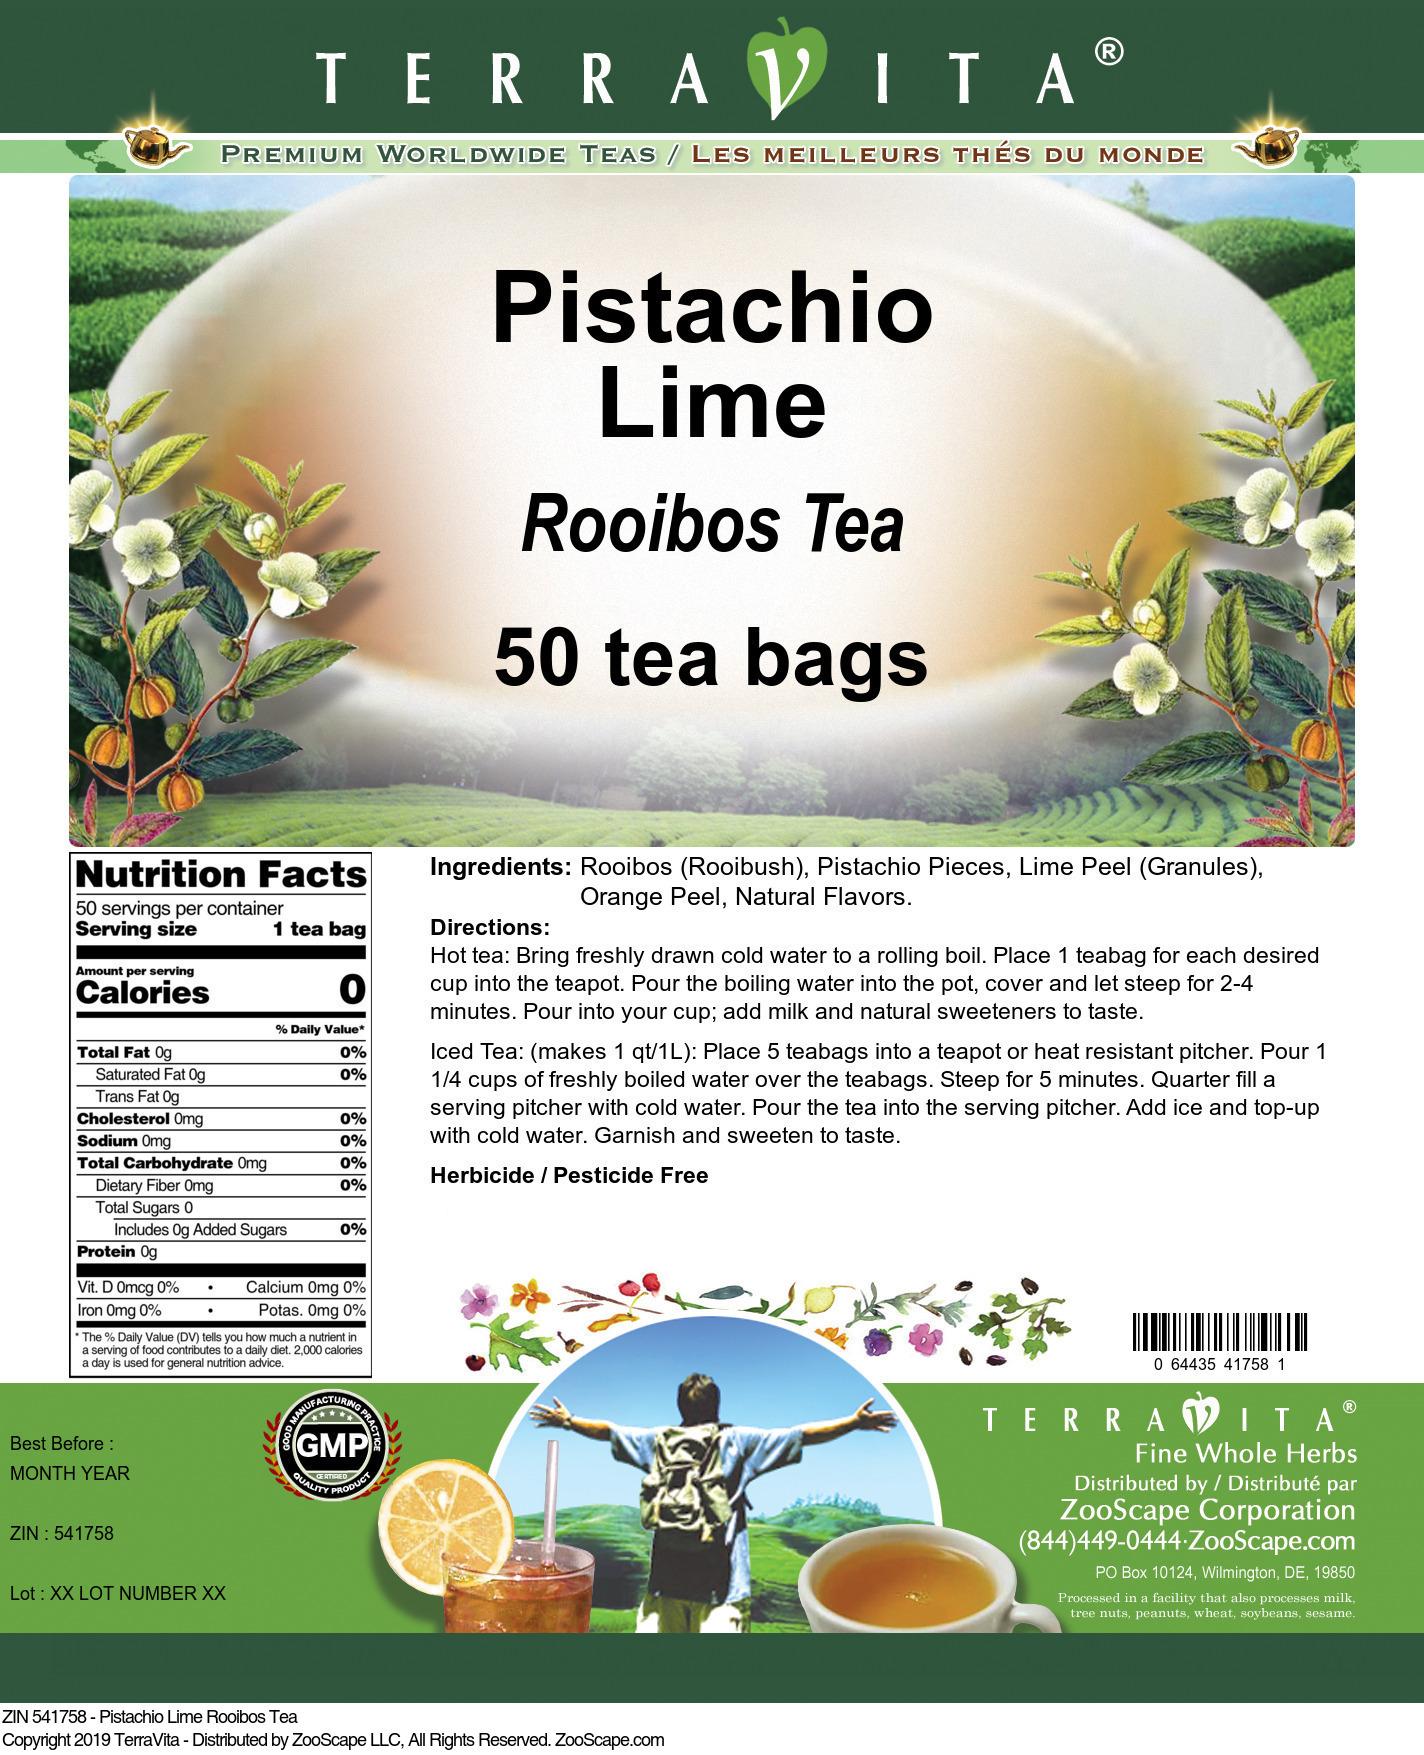 Pistachio Lime Rooibos Tea